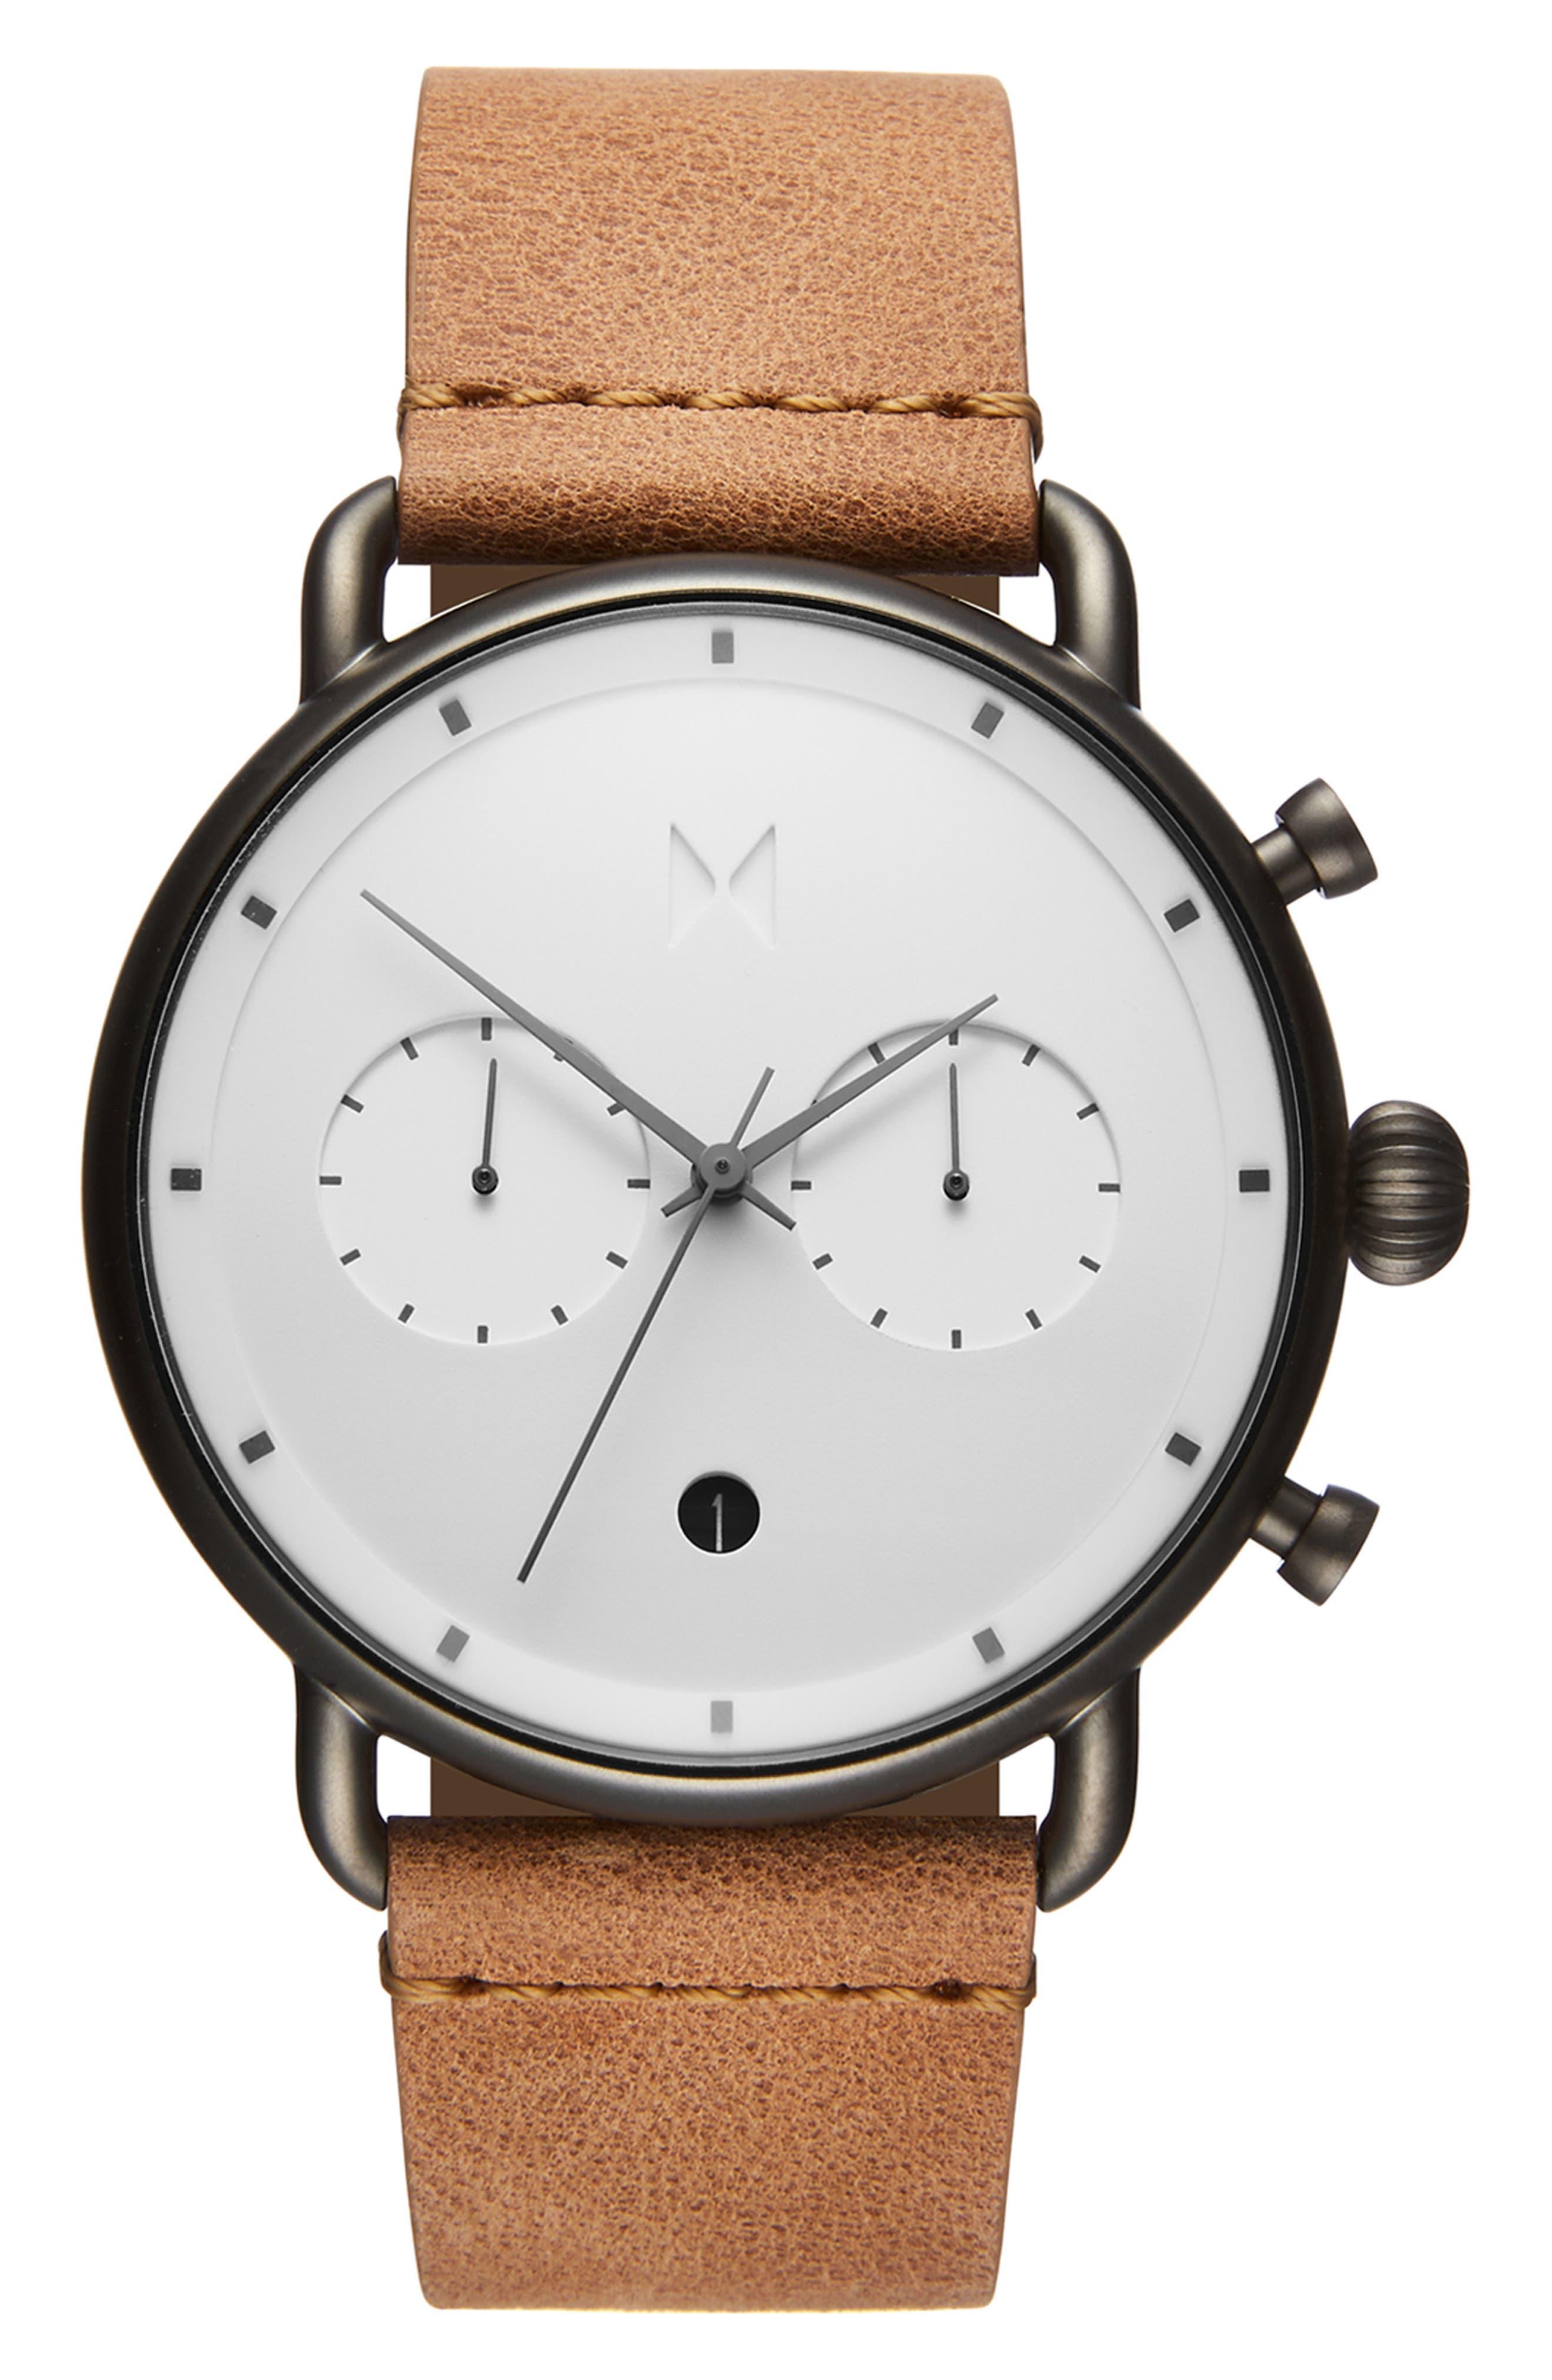 Blacktop Chronograph Leather Strap Watch,                             Main thumbnail 1, color,                             WHITE/ CARAMEL